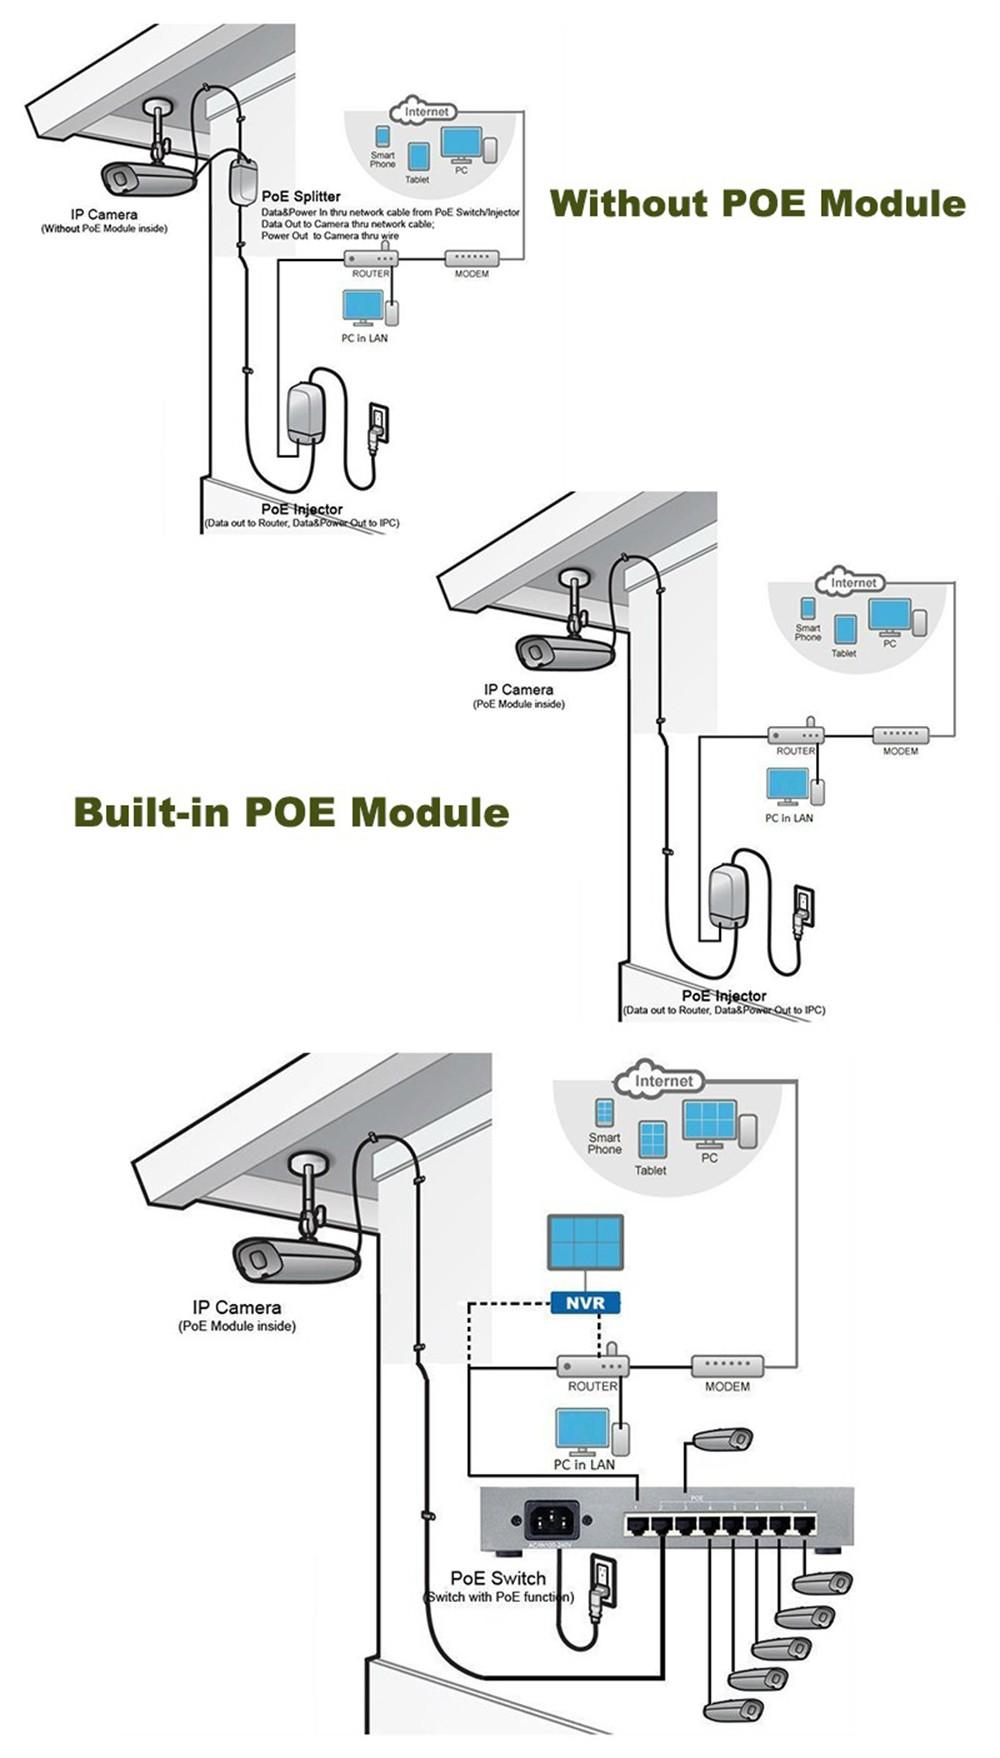 Techege 2mp 48v Poe Ip Camera 4mp 25921520 Vandalproof Power Over Ethernet Wiring Diagram Htb1rrqqjvxxxxxnxxxxq6xxfxxxo Htb1aflvjvxxxxbfxxxxq6xxfxxxr